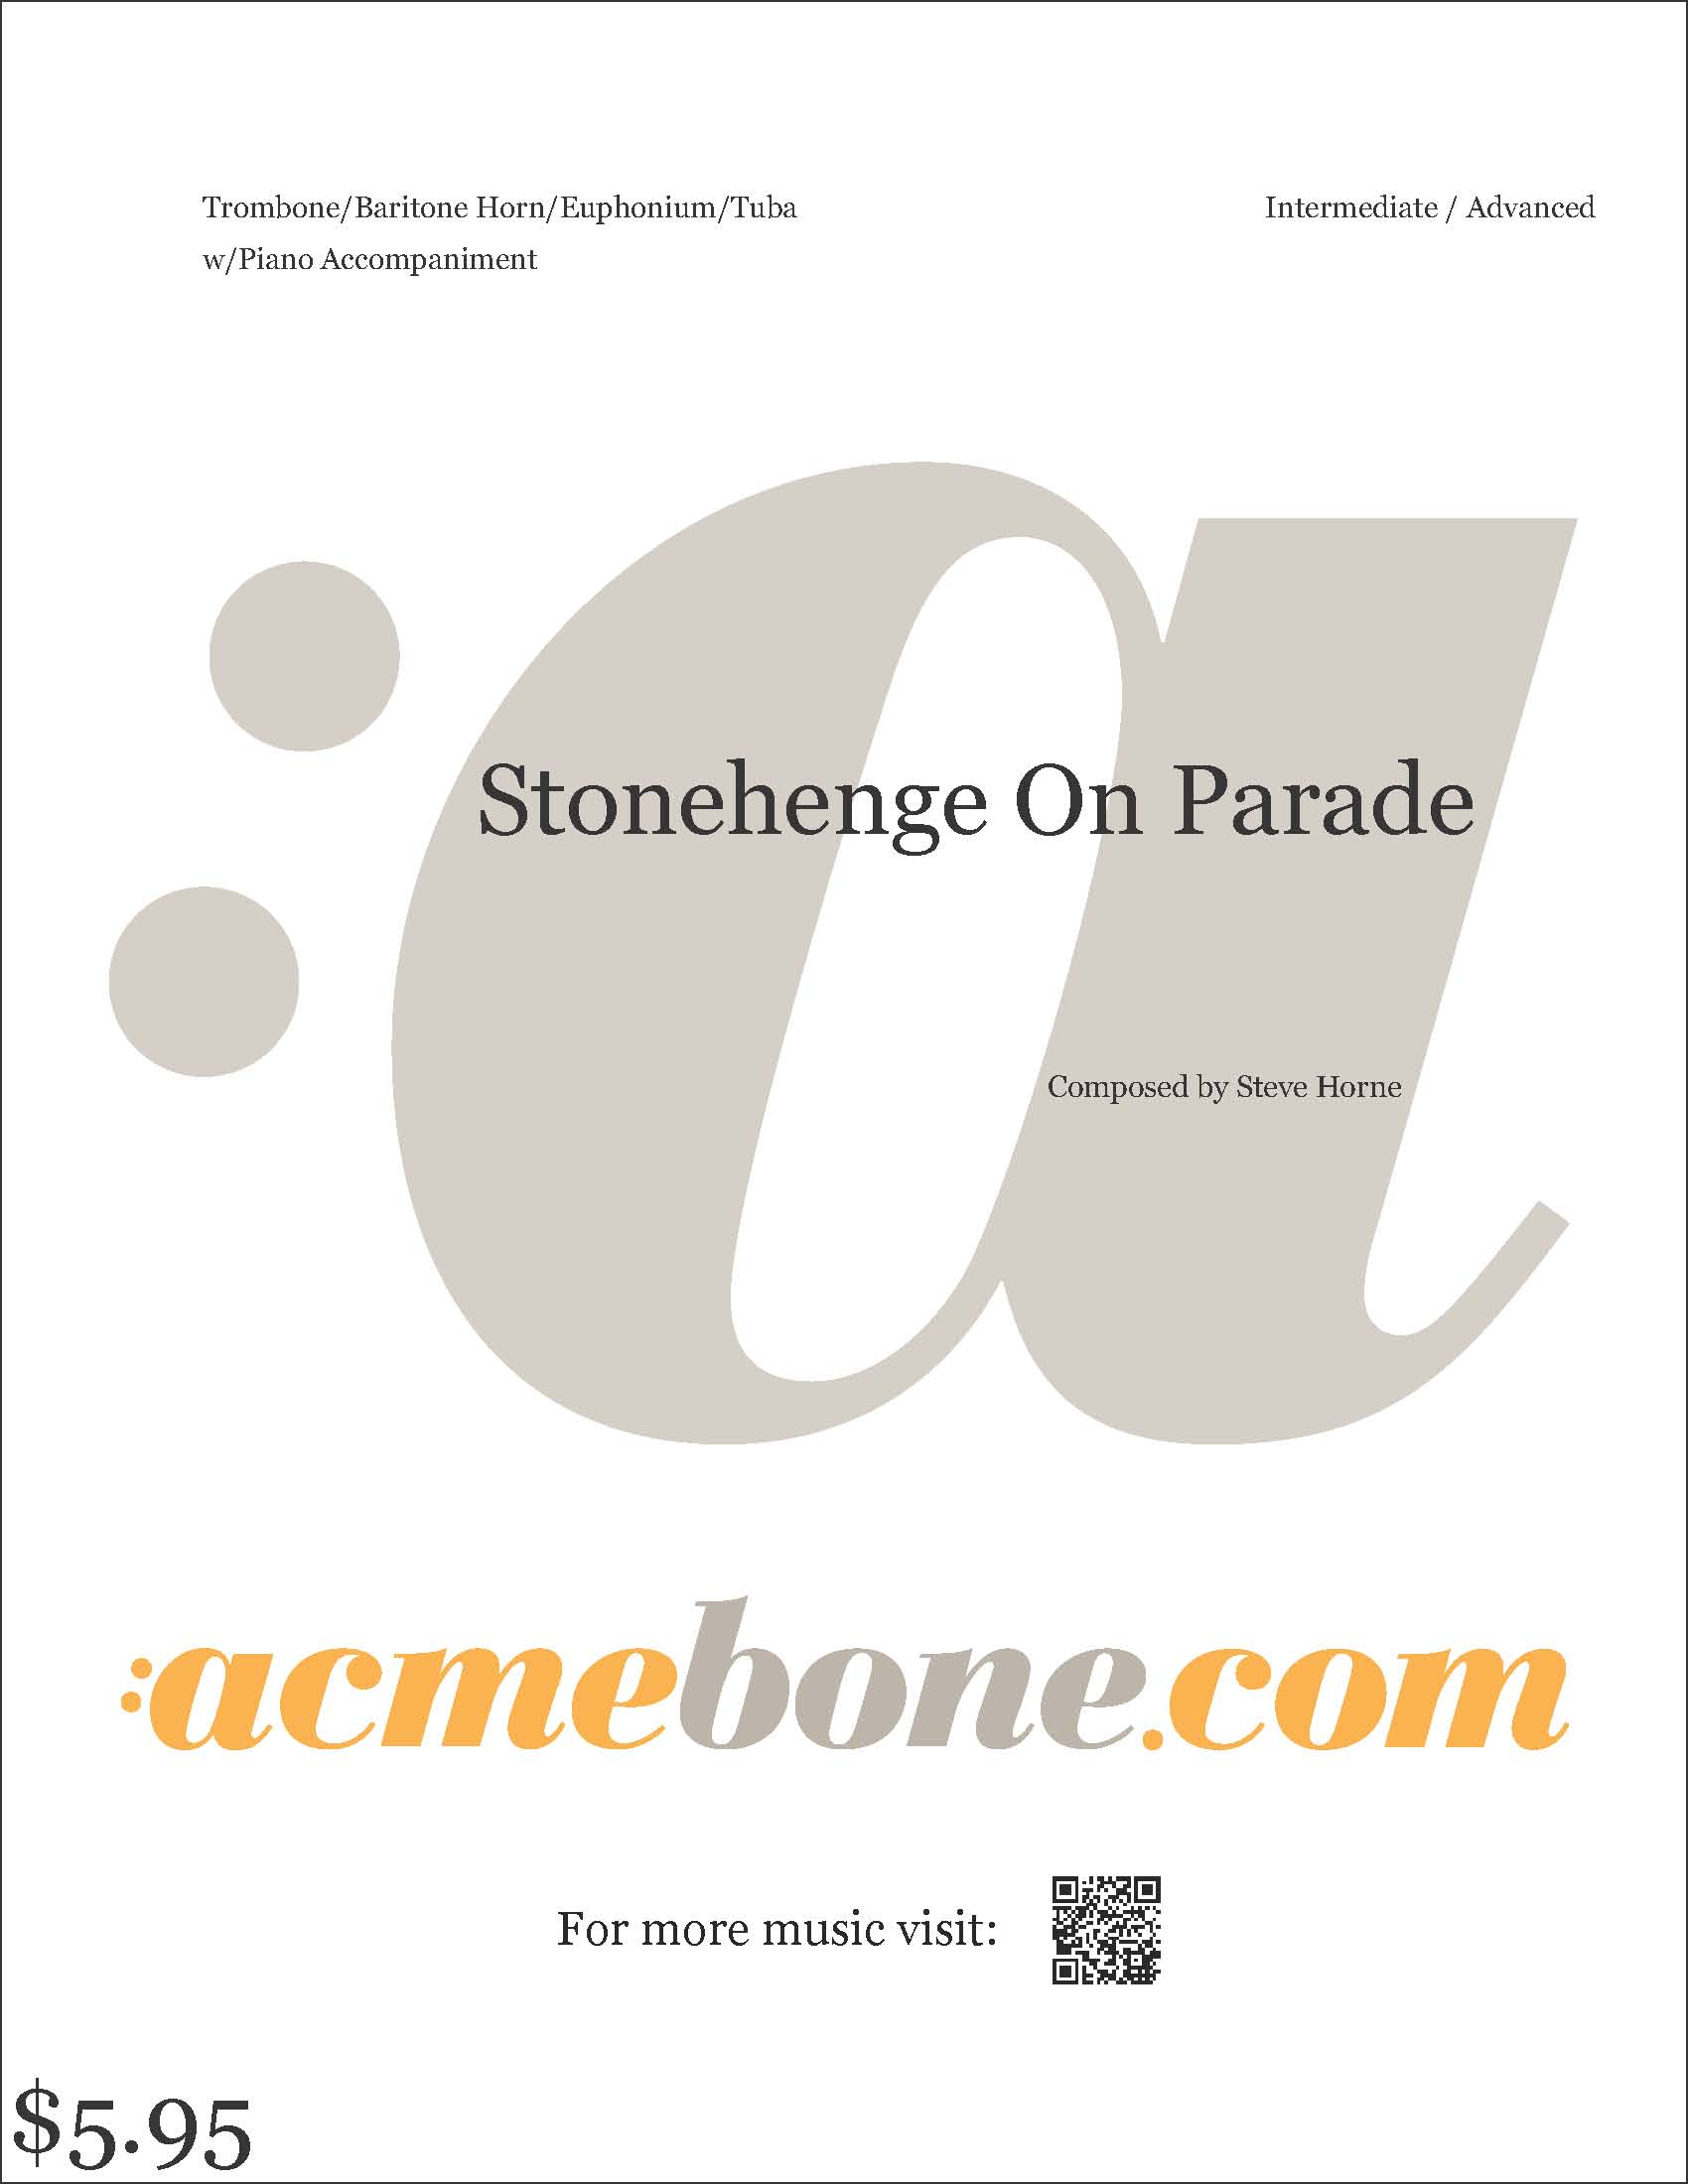 Stonehenge On Parade_digital_cover_w-bo_price.jpg